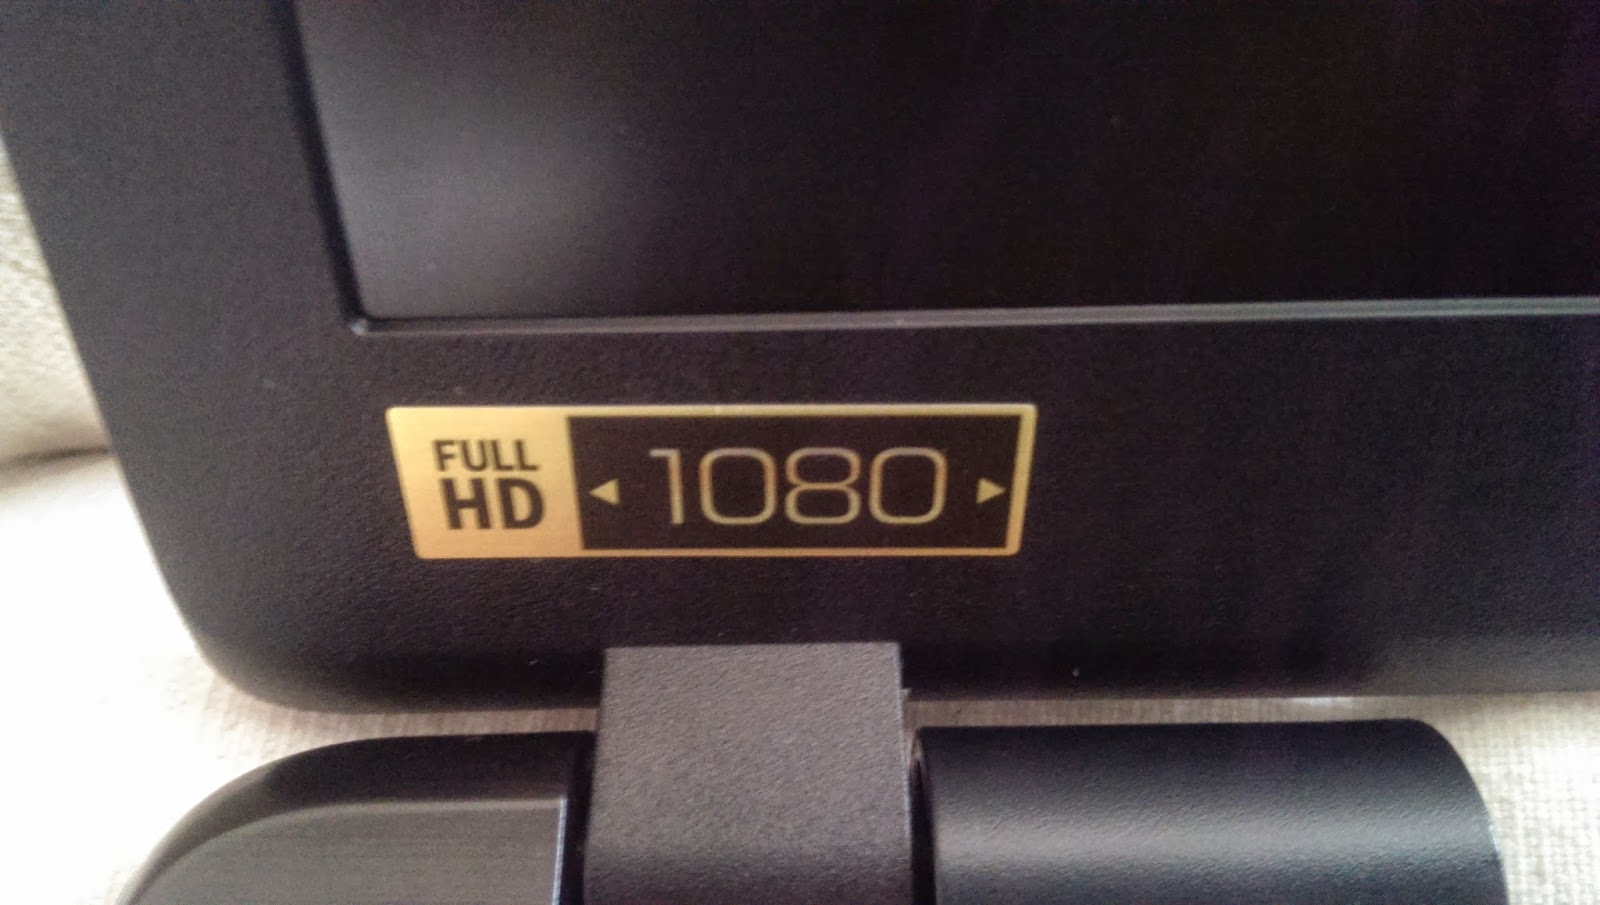 2015 03 22%2B12.14.29 - [開箱] Acer E5-572G i5-4210M 搭配NVIDIA 840G 2G獨顯